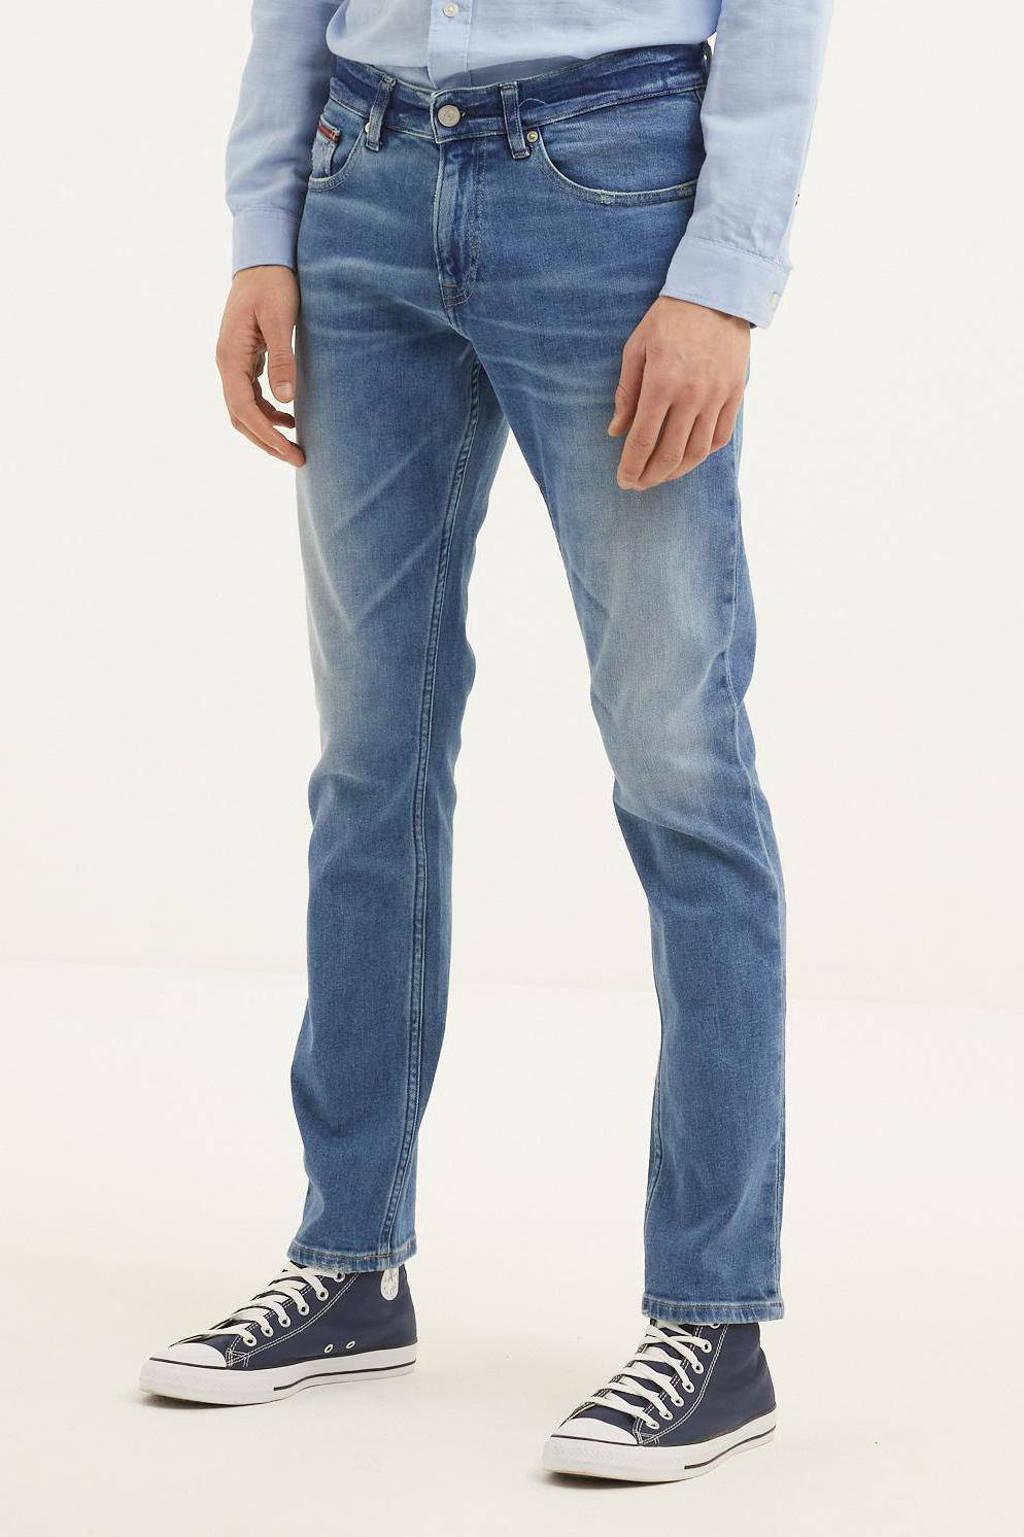 Tommy Jeans slim fit jeans SCANTON 1ab stark lb str, 1AB Stark Lb Str